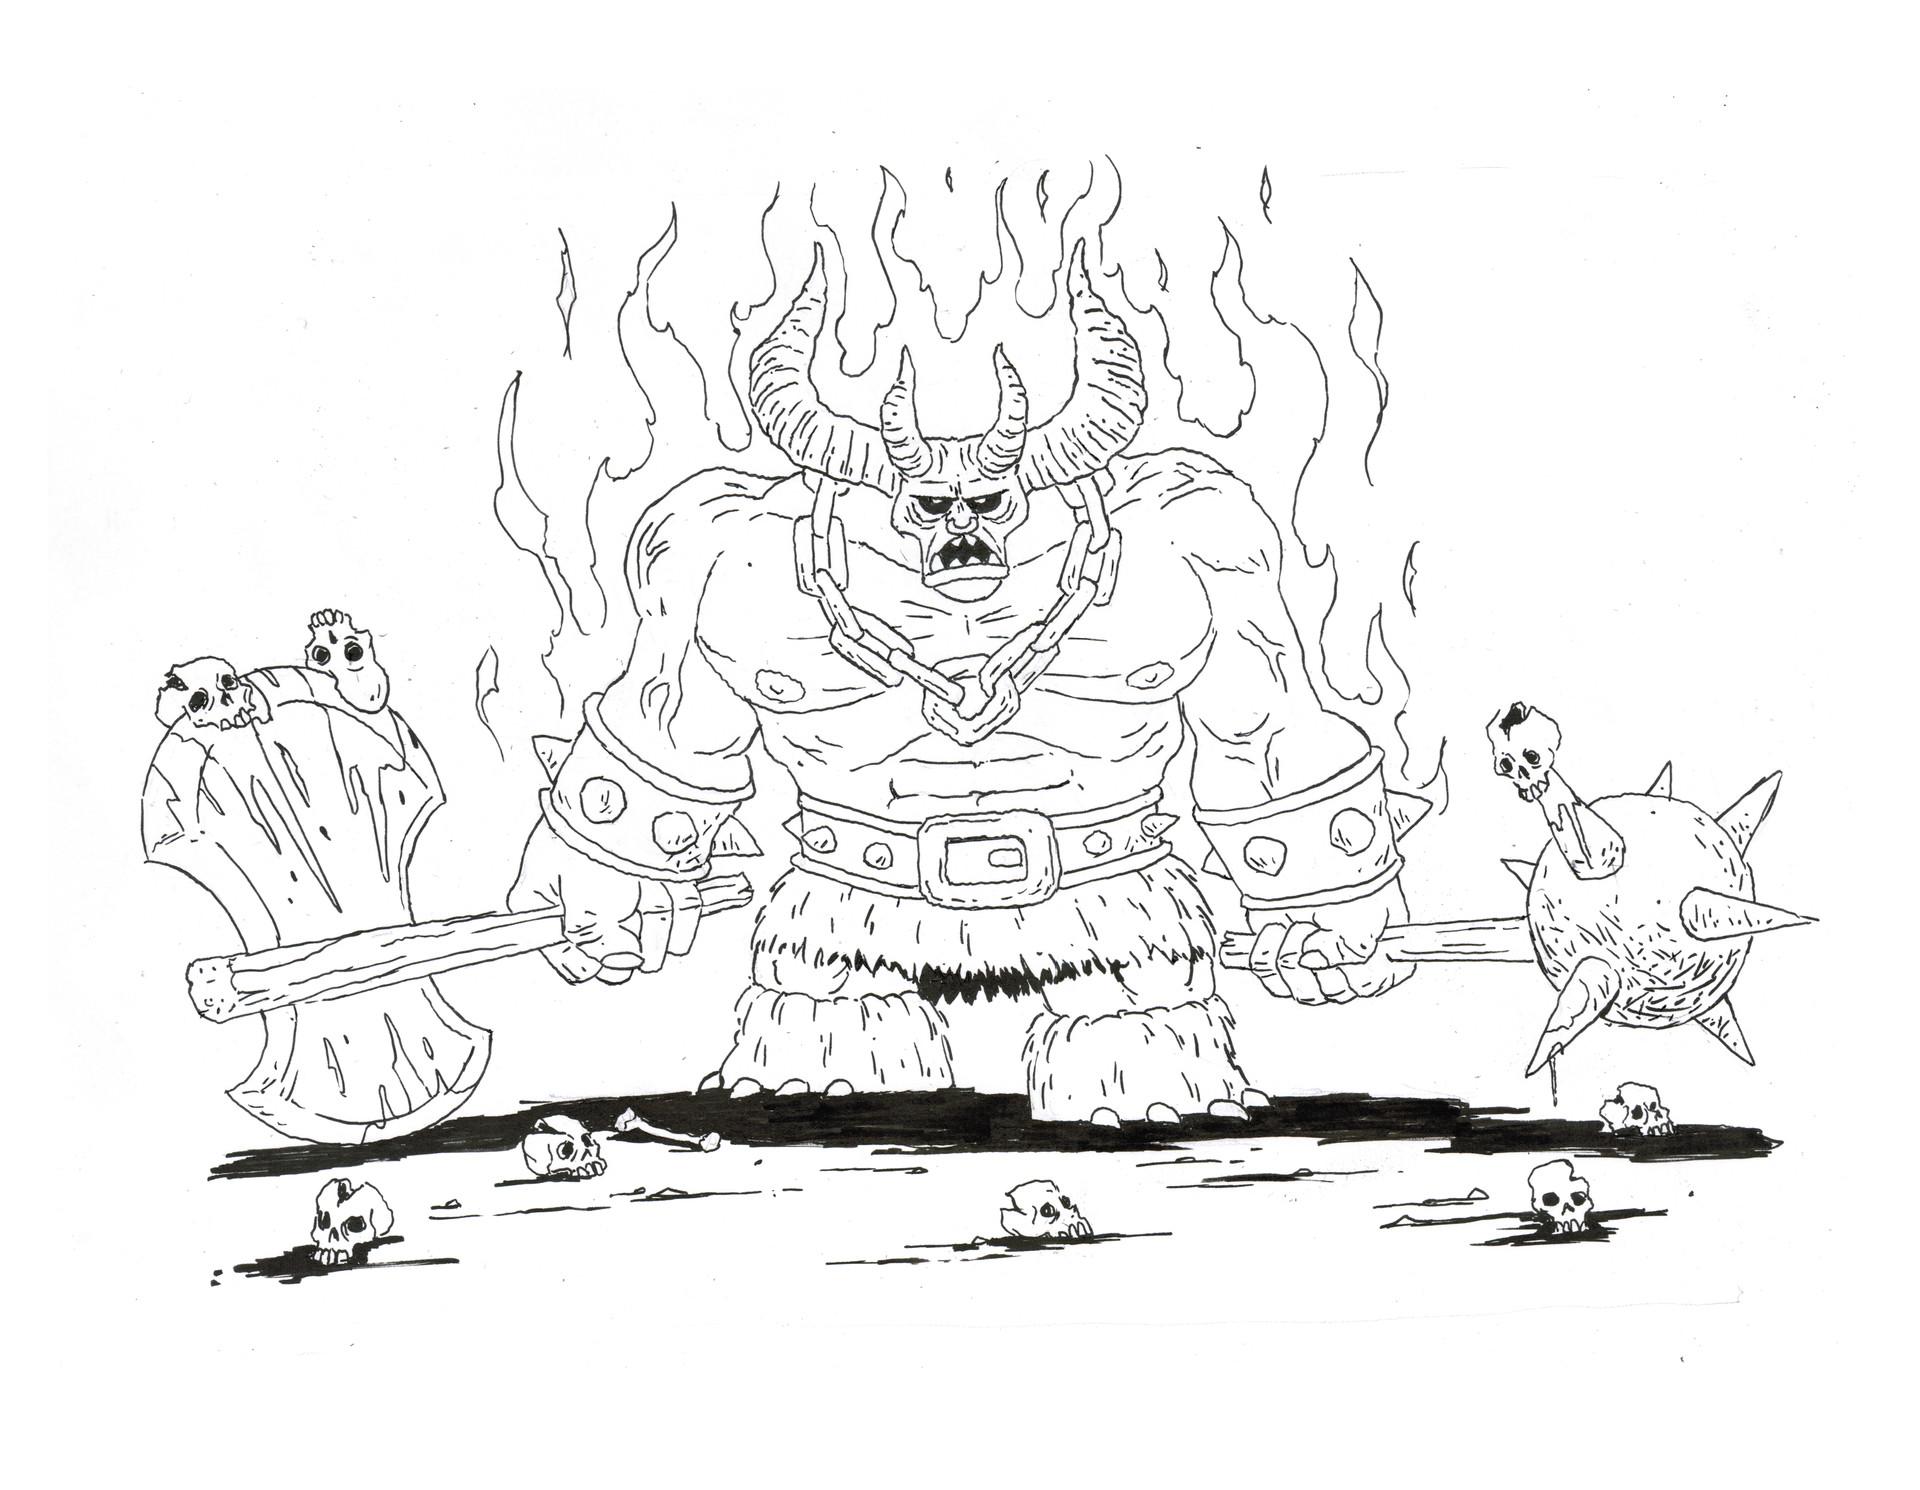 Jim bryson strongdemon ink 01